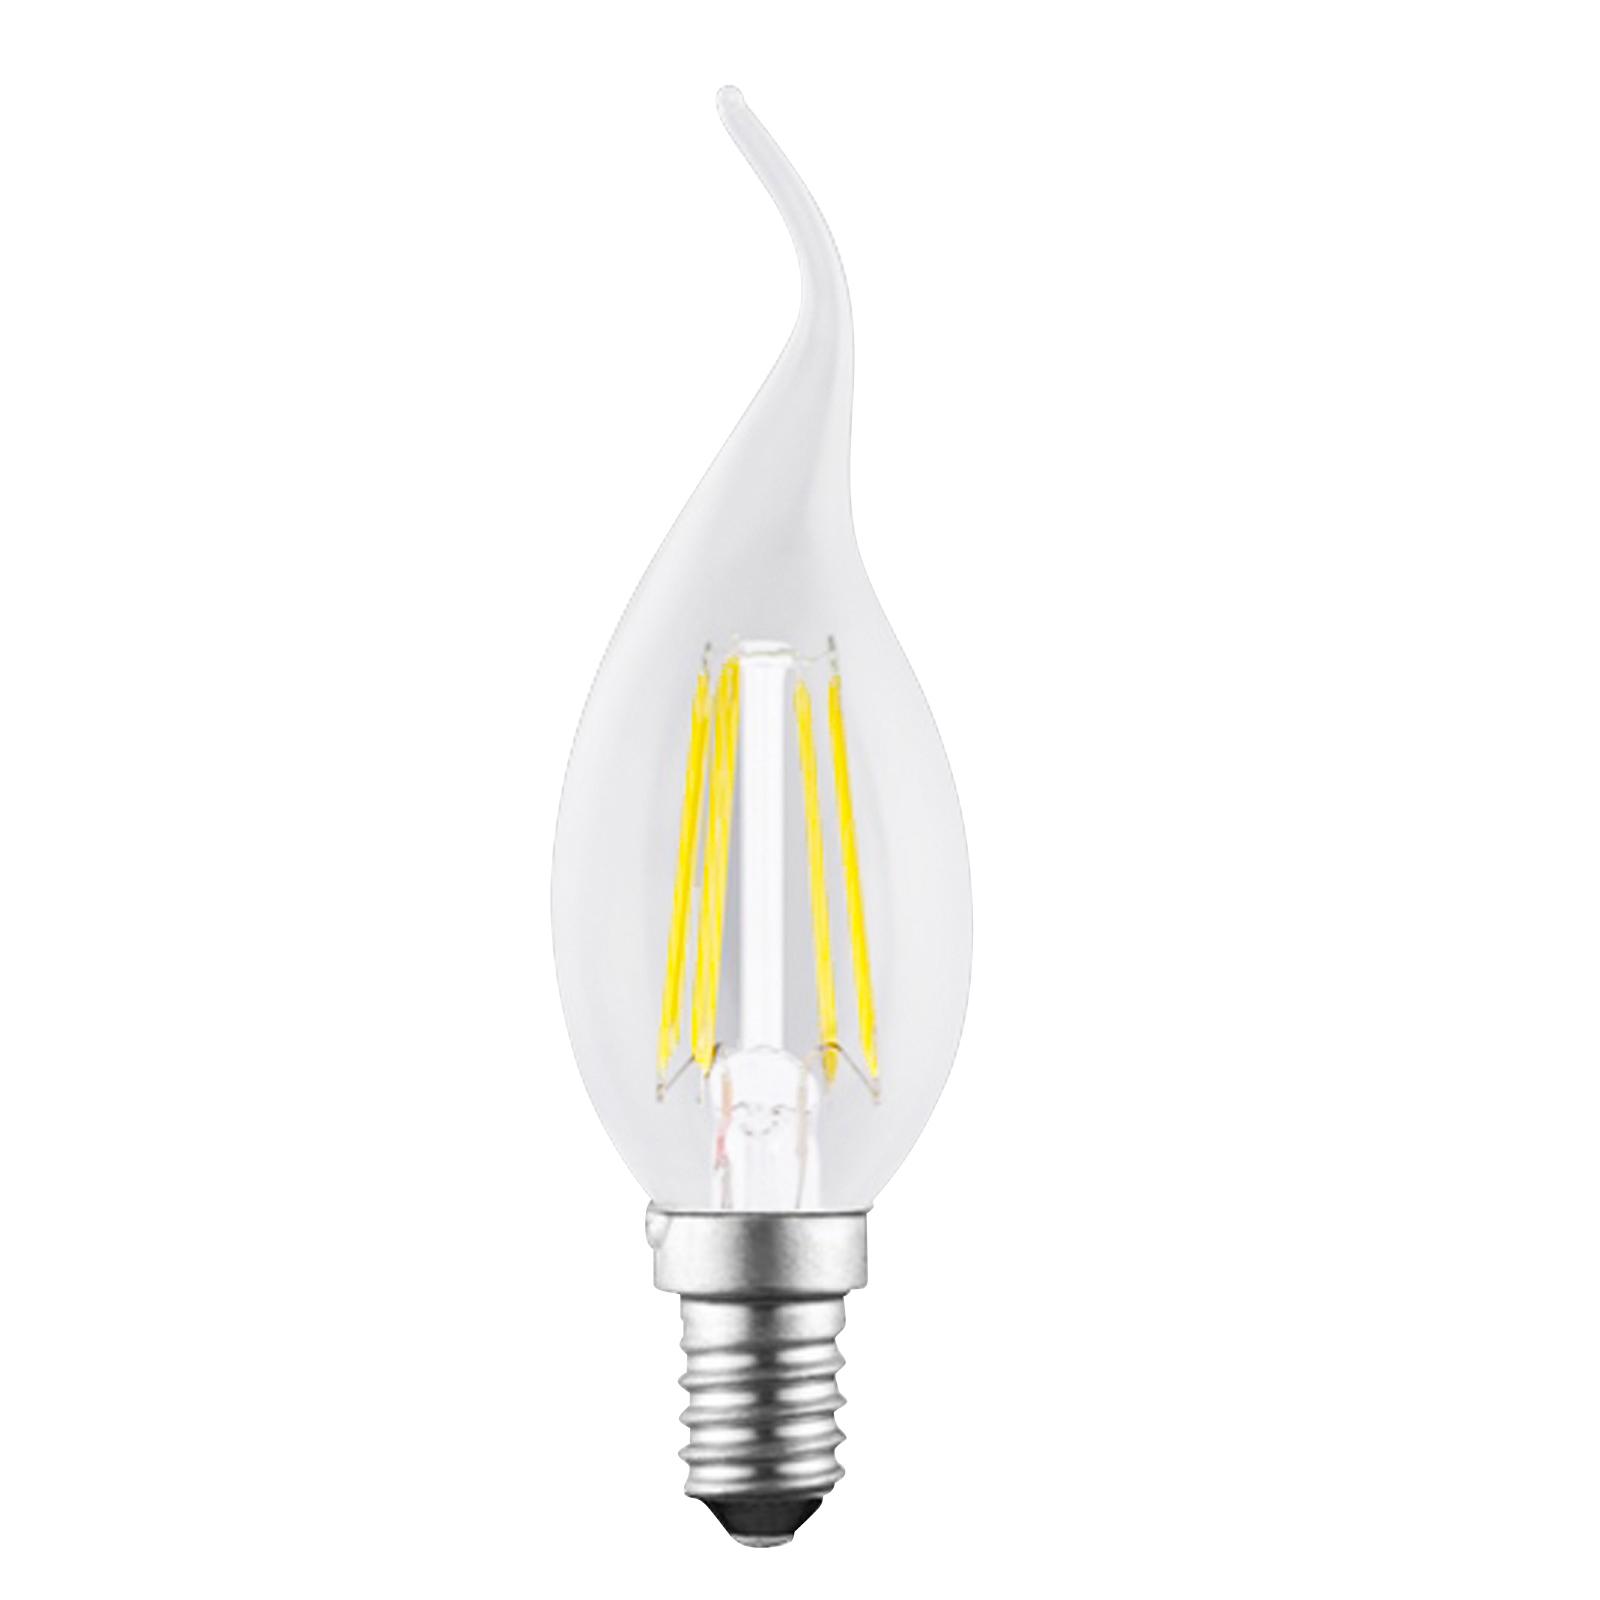 LED-mignonpære E14 4W Filament klar 827 flammeform